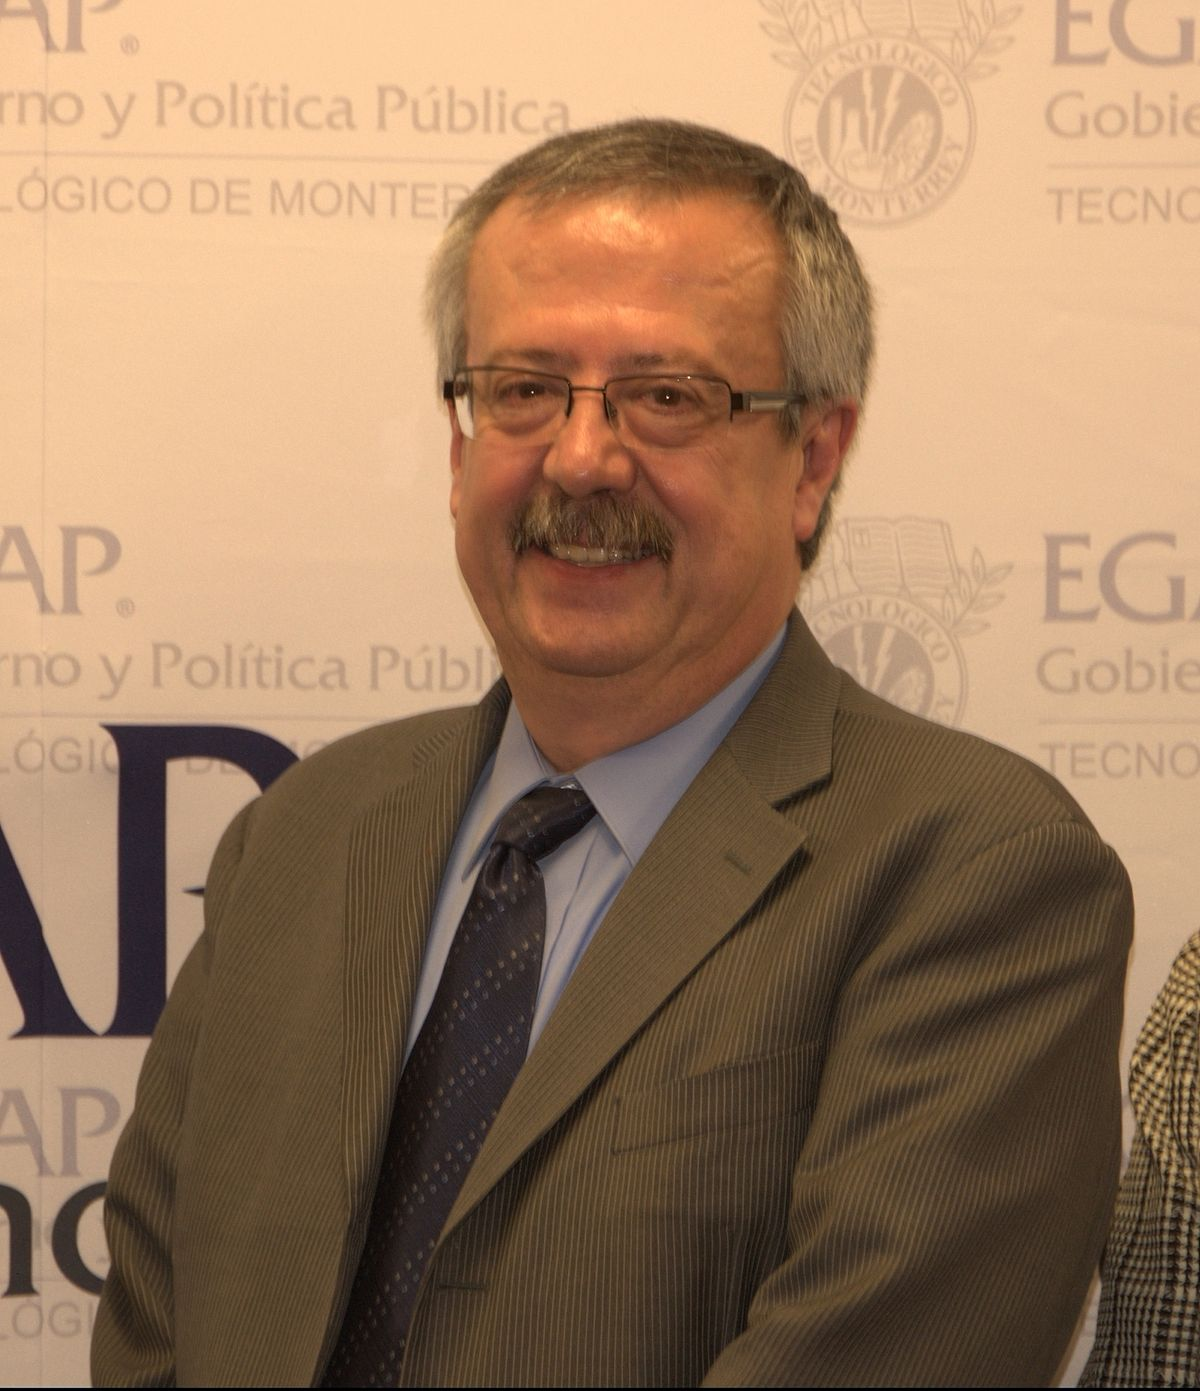 Santa Fe 2018 >> Carlos Manuel Urzúa Macías - Wikipedia